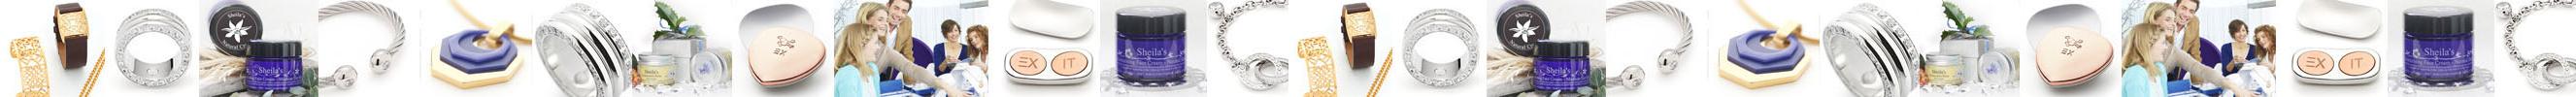 Aura3 UK Jewellery and organic skincare